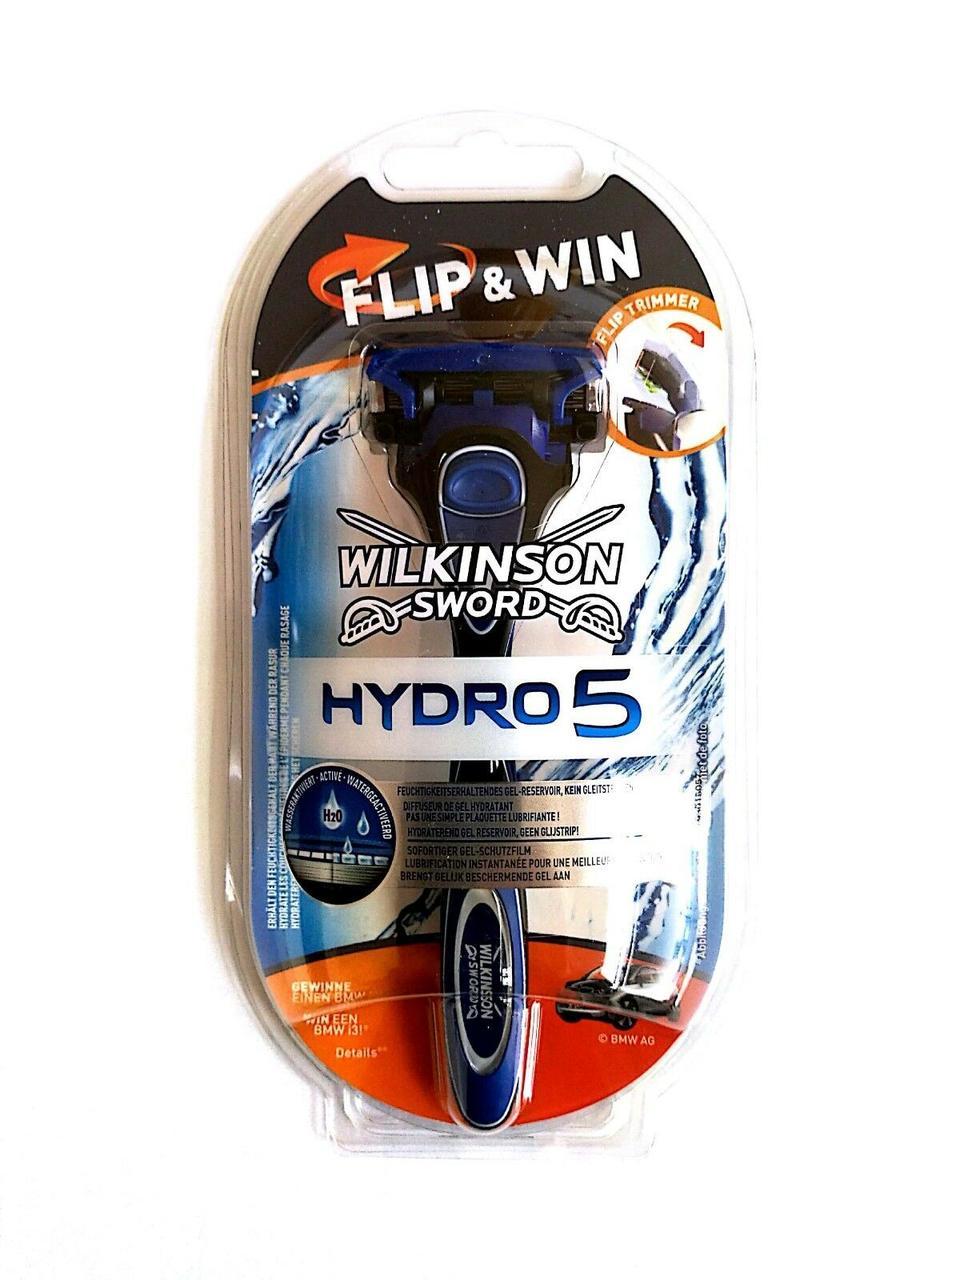 Мужской станок для бритья Wilkinson Sword Hydro 5 Flip&Win с подставкой 01101